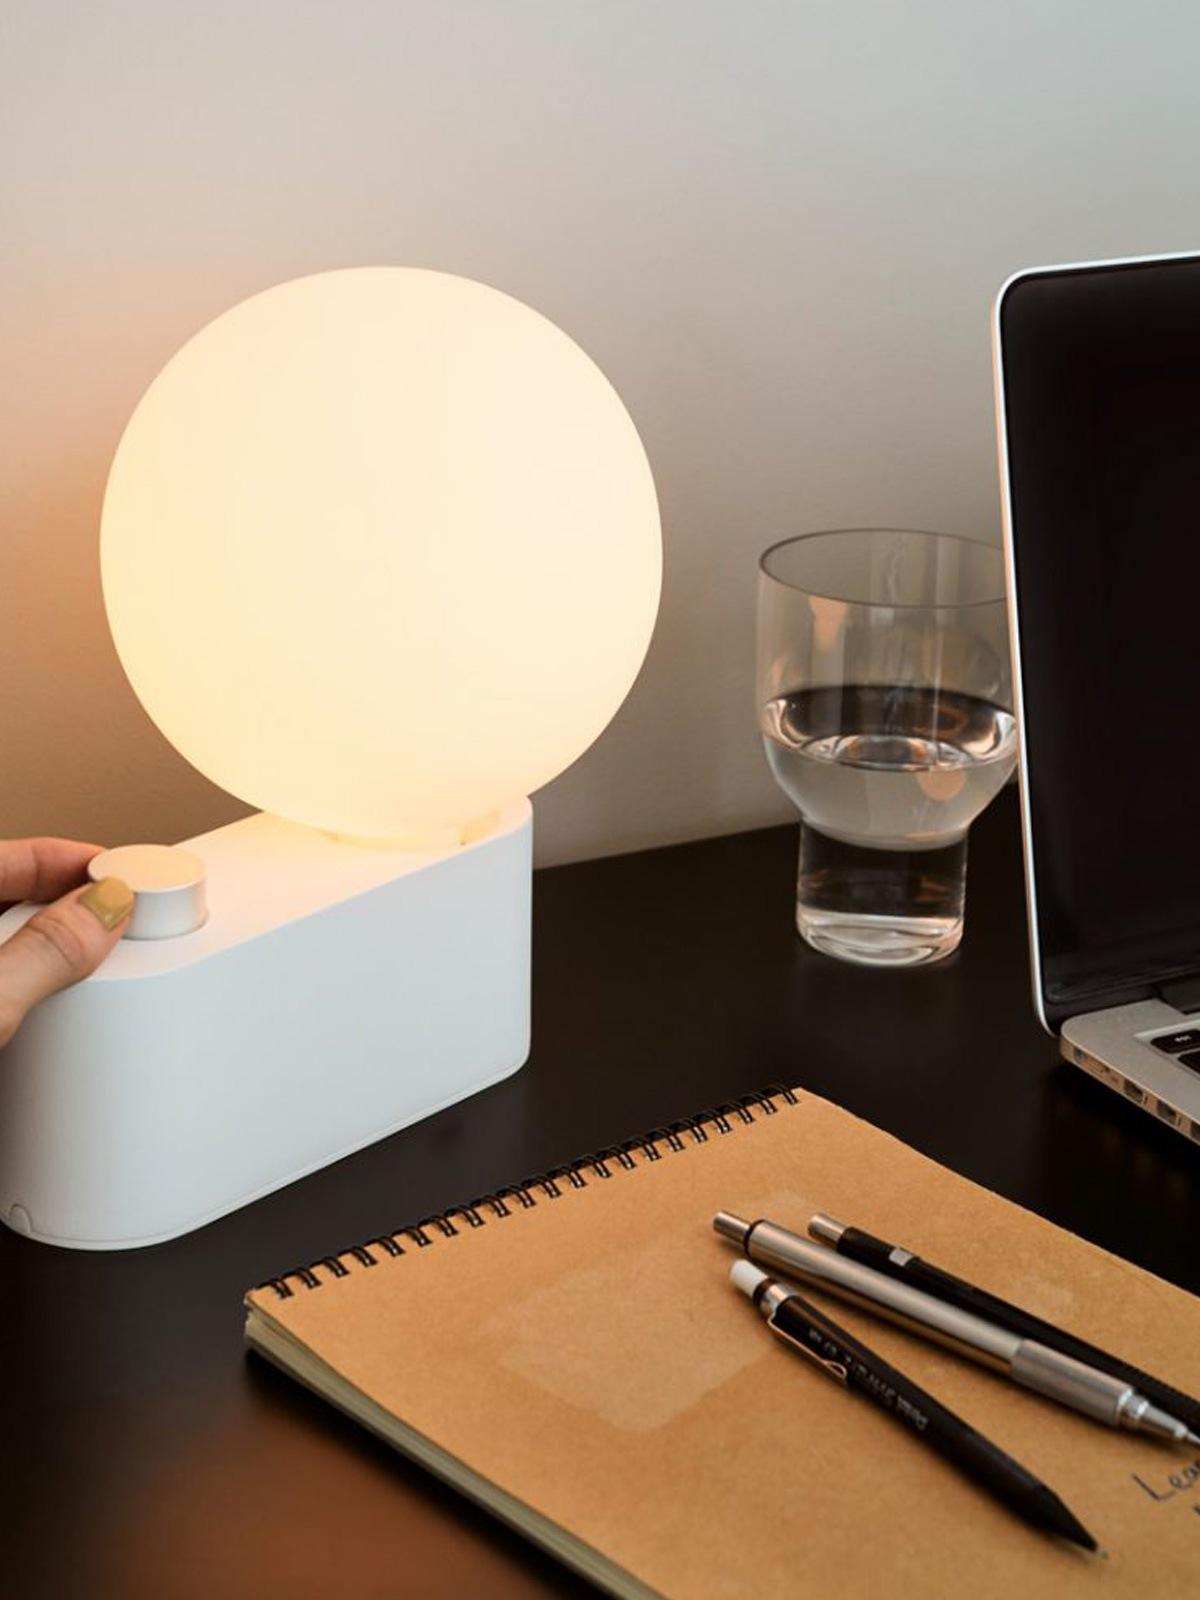 Tala Alumina Tischlampe mit mundgeblasenem Leuchtmittel DesignOrt Lampen Berlin